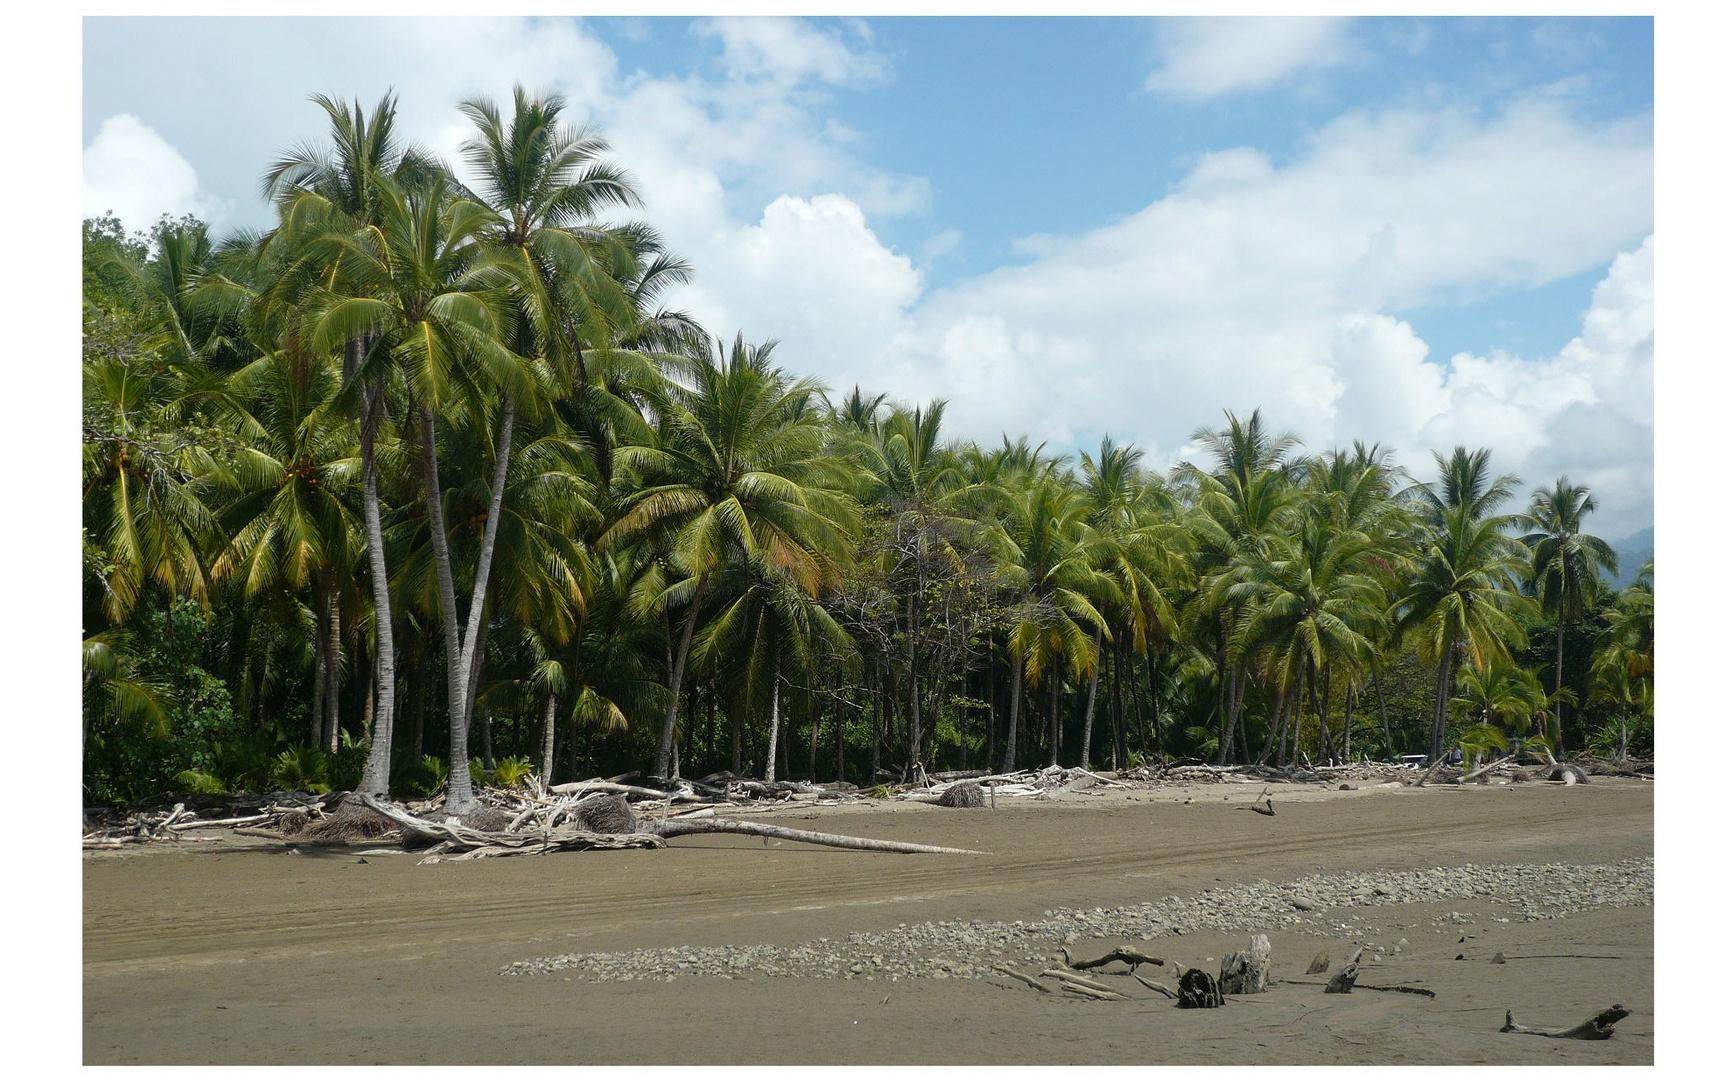 Costa Rica - im Januar 2012 unterwegs im Öko-Musterland